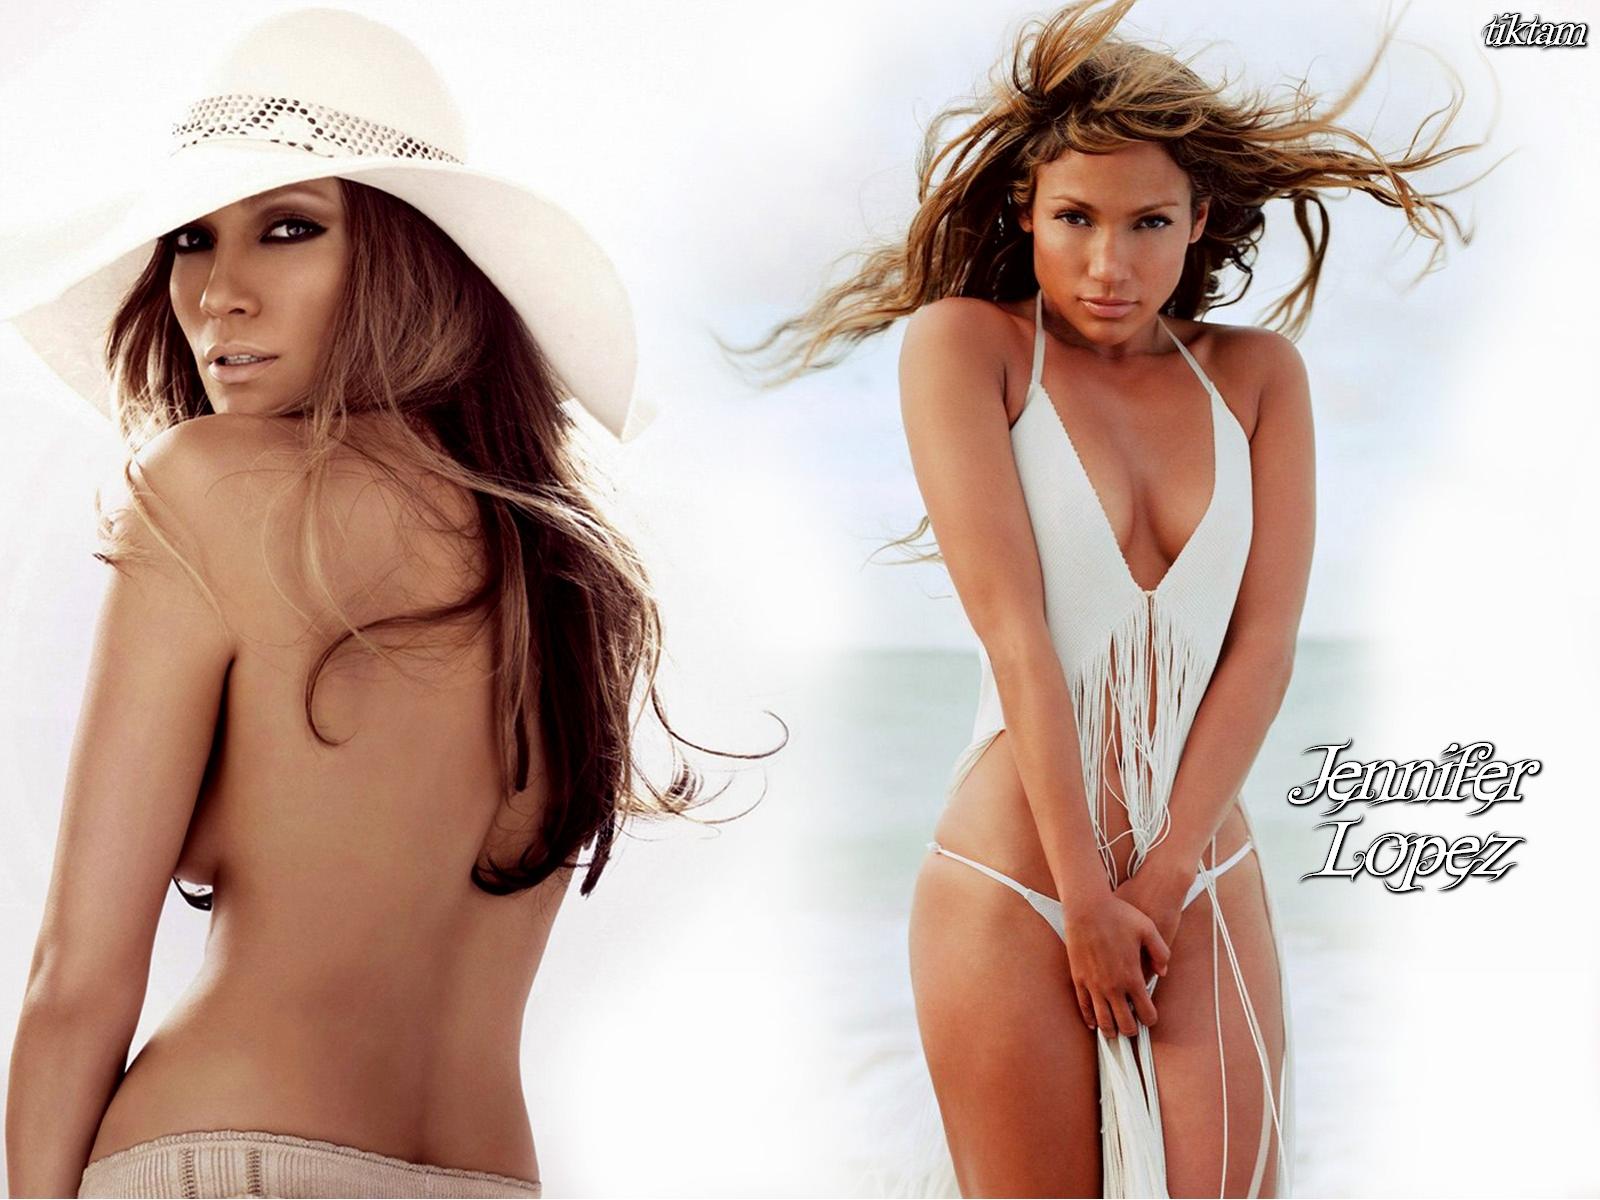 http://2.bp.blogspot.com/--MO-QSRKrSw/ThlRpBNKMVI/AAAAAAAAAQ4/1R76W0GF85o/s1600/Jennifer-Lopez-jennifer-lopez-43913_1600_1200.jpg